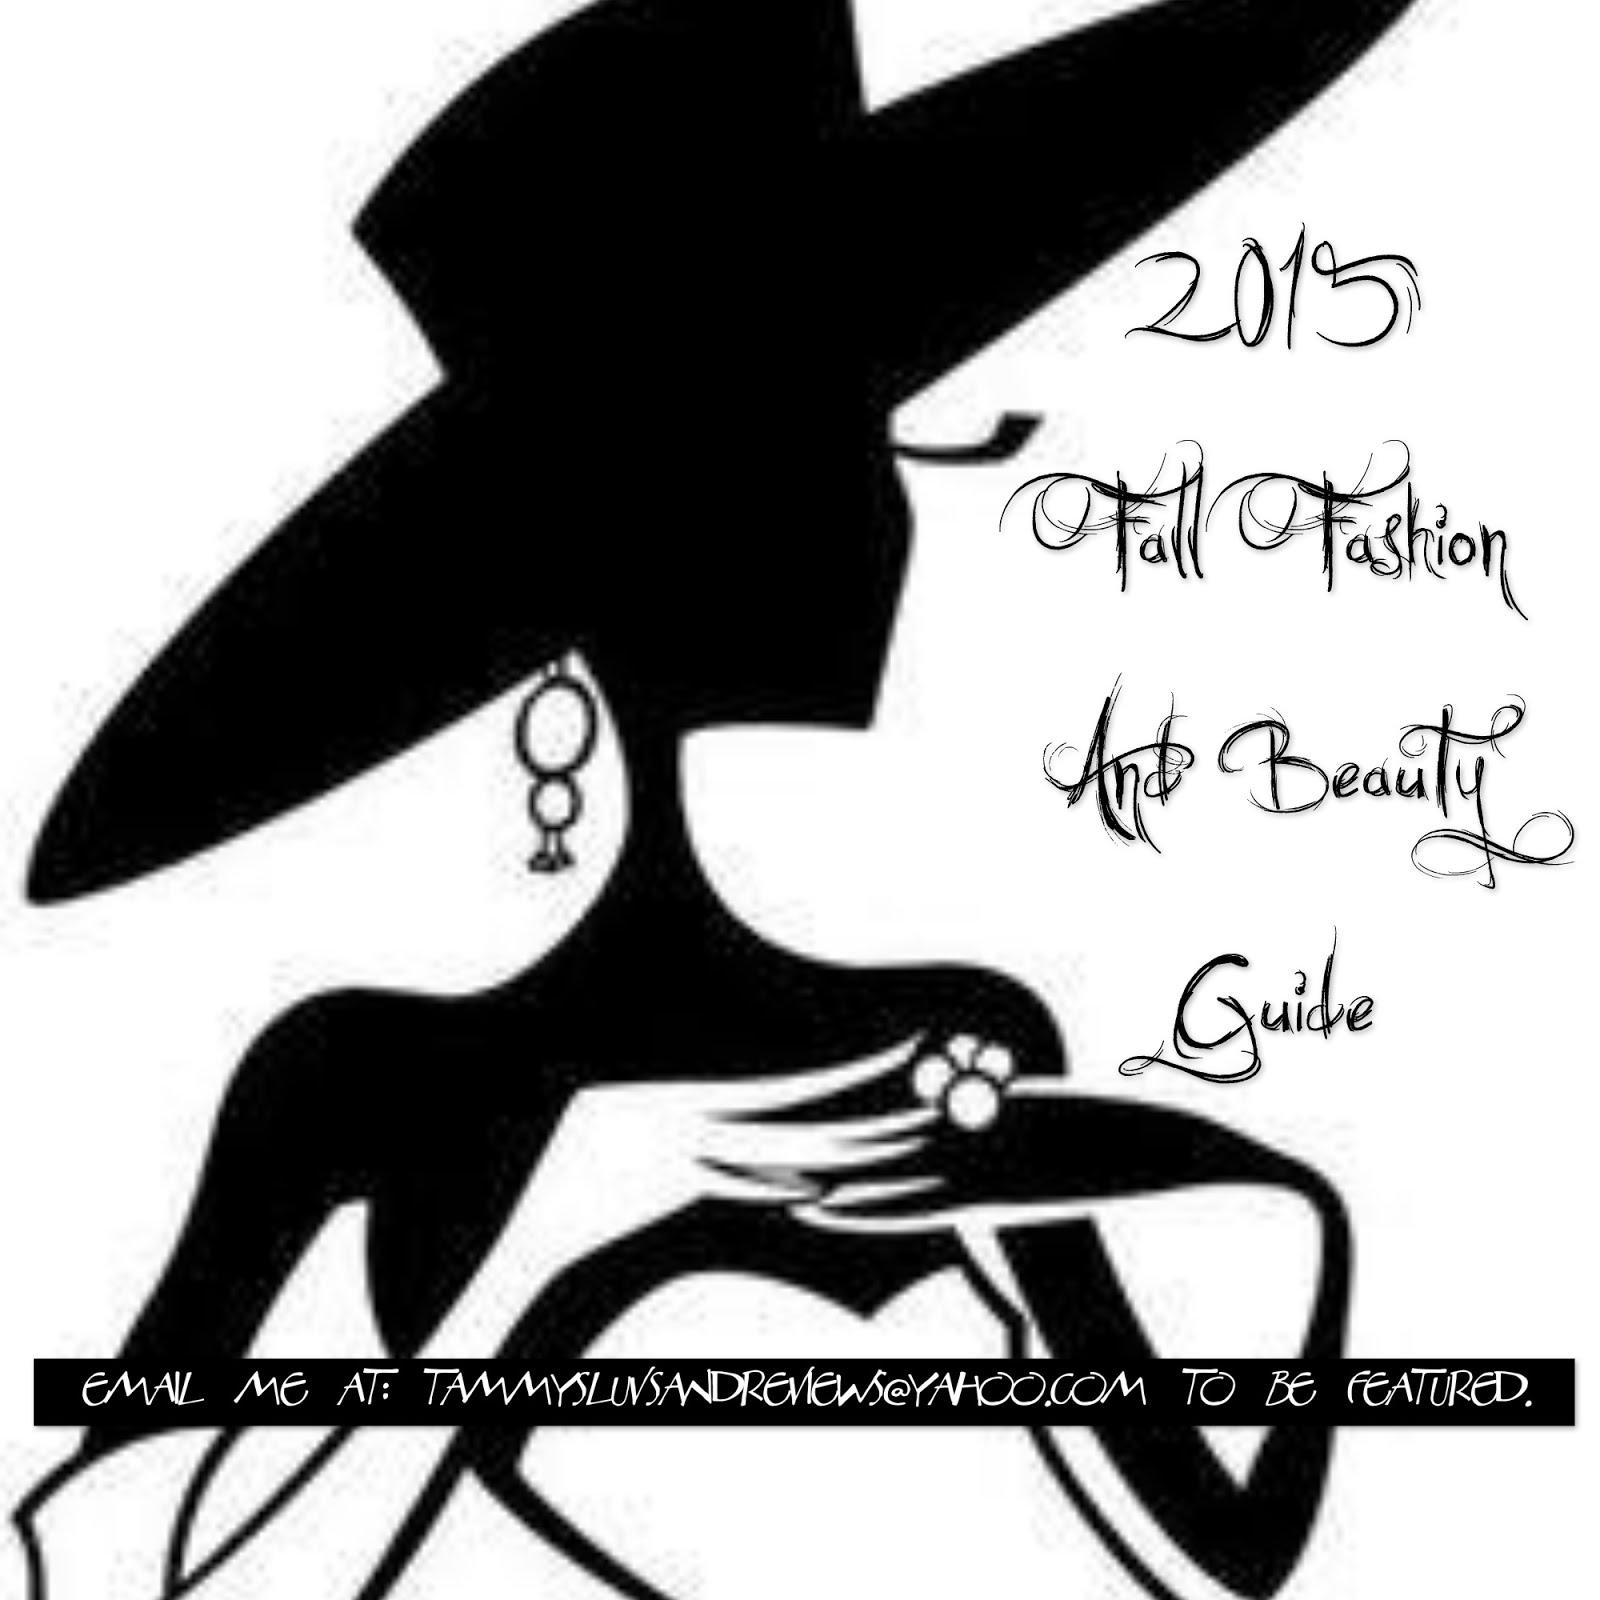 2015 Fall Fashion And Beauty Guide